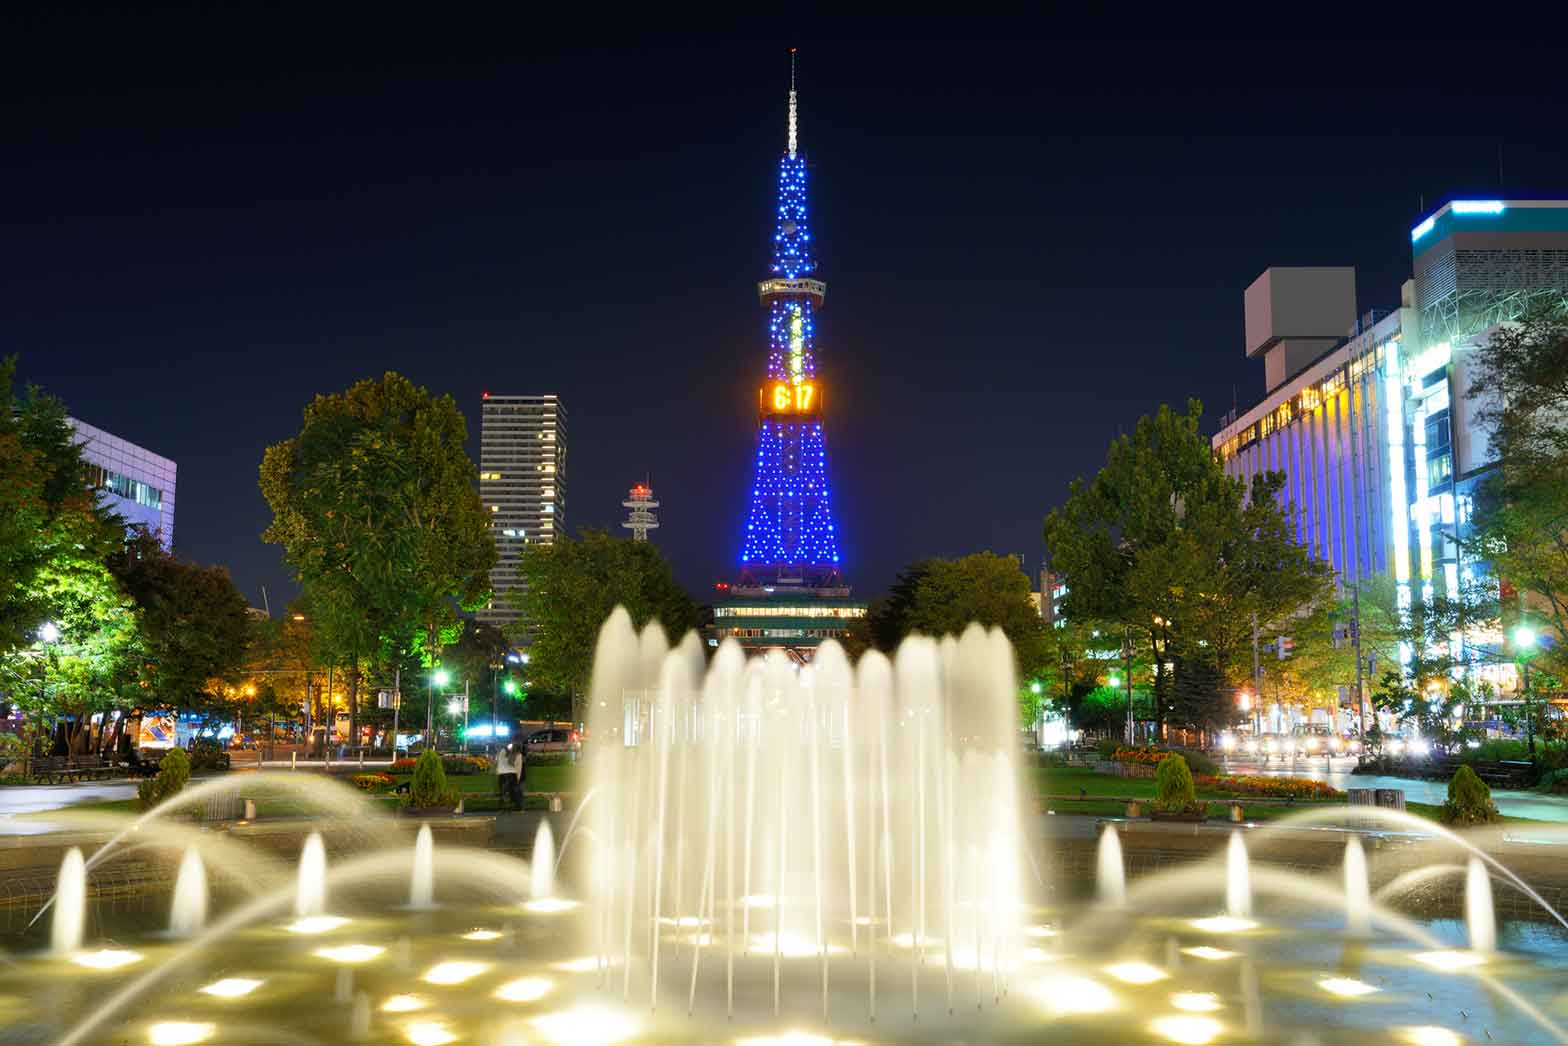 Tower at Odori Park in Sapporo